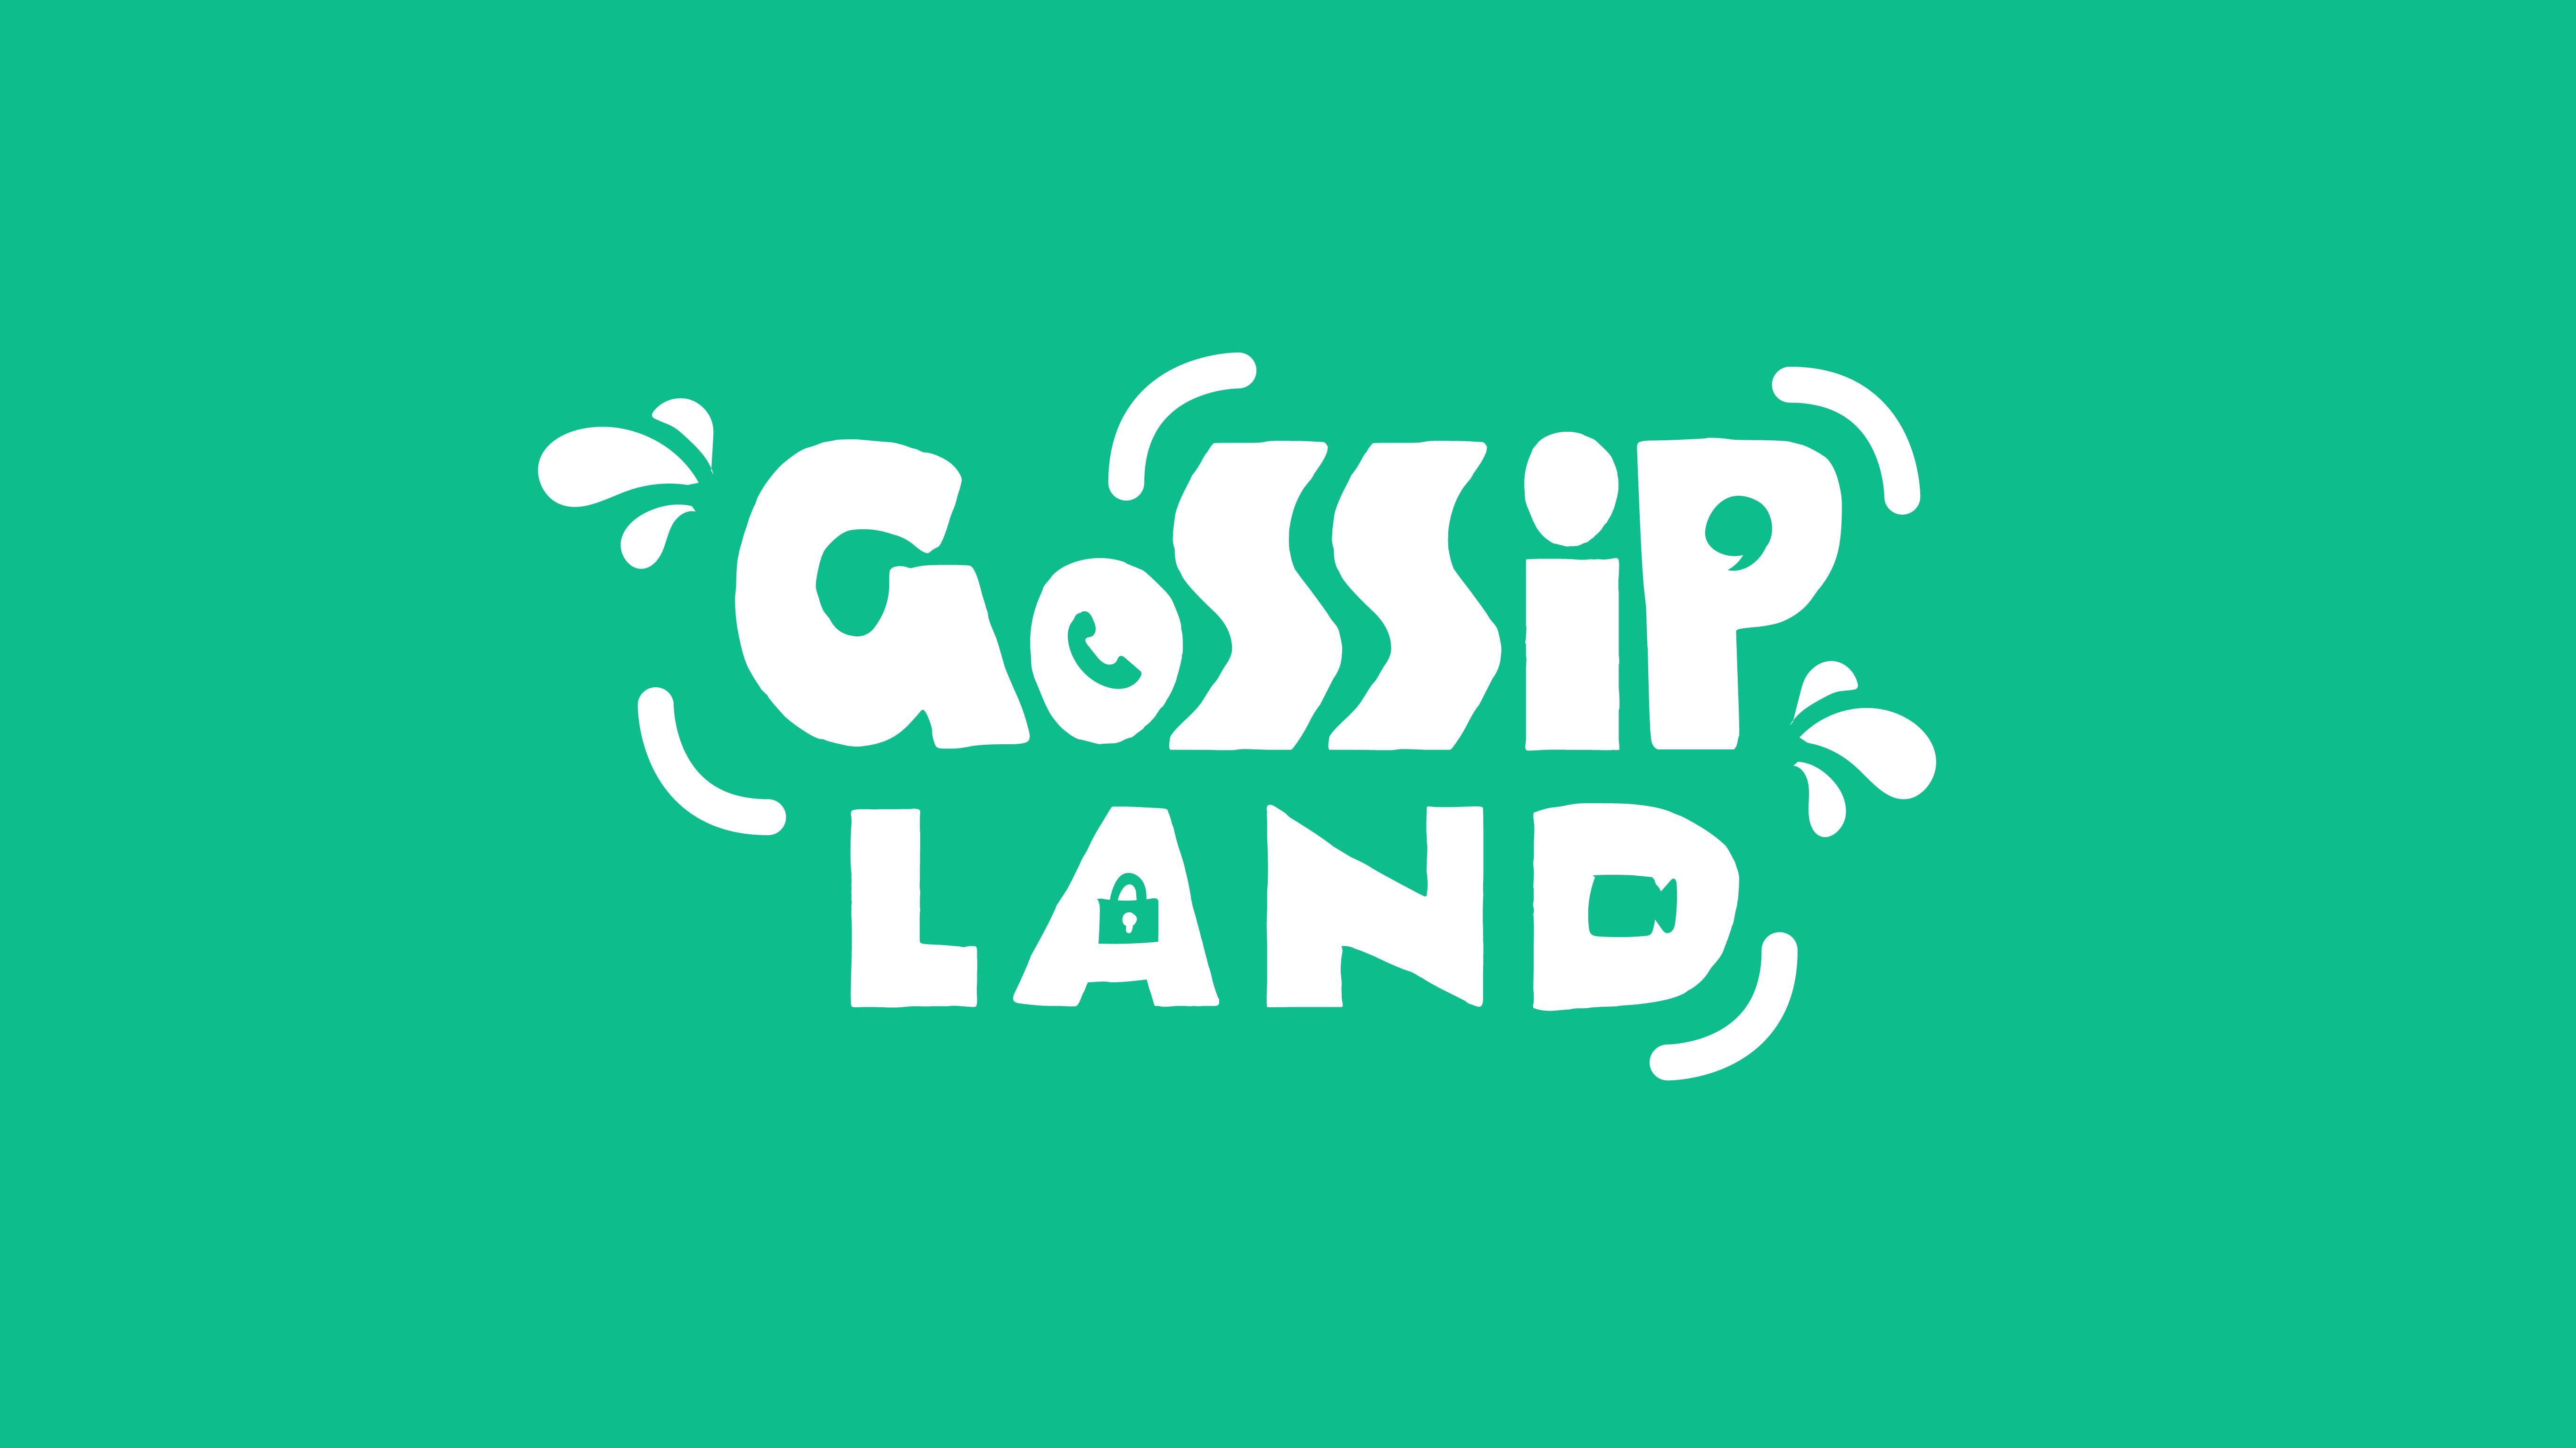 A logo for Gossip Land